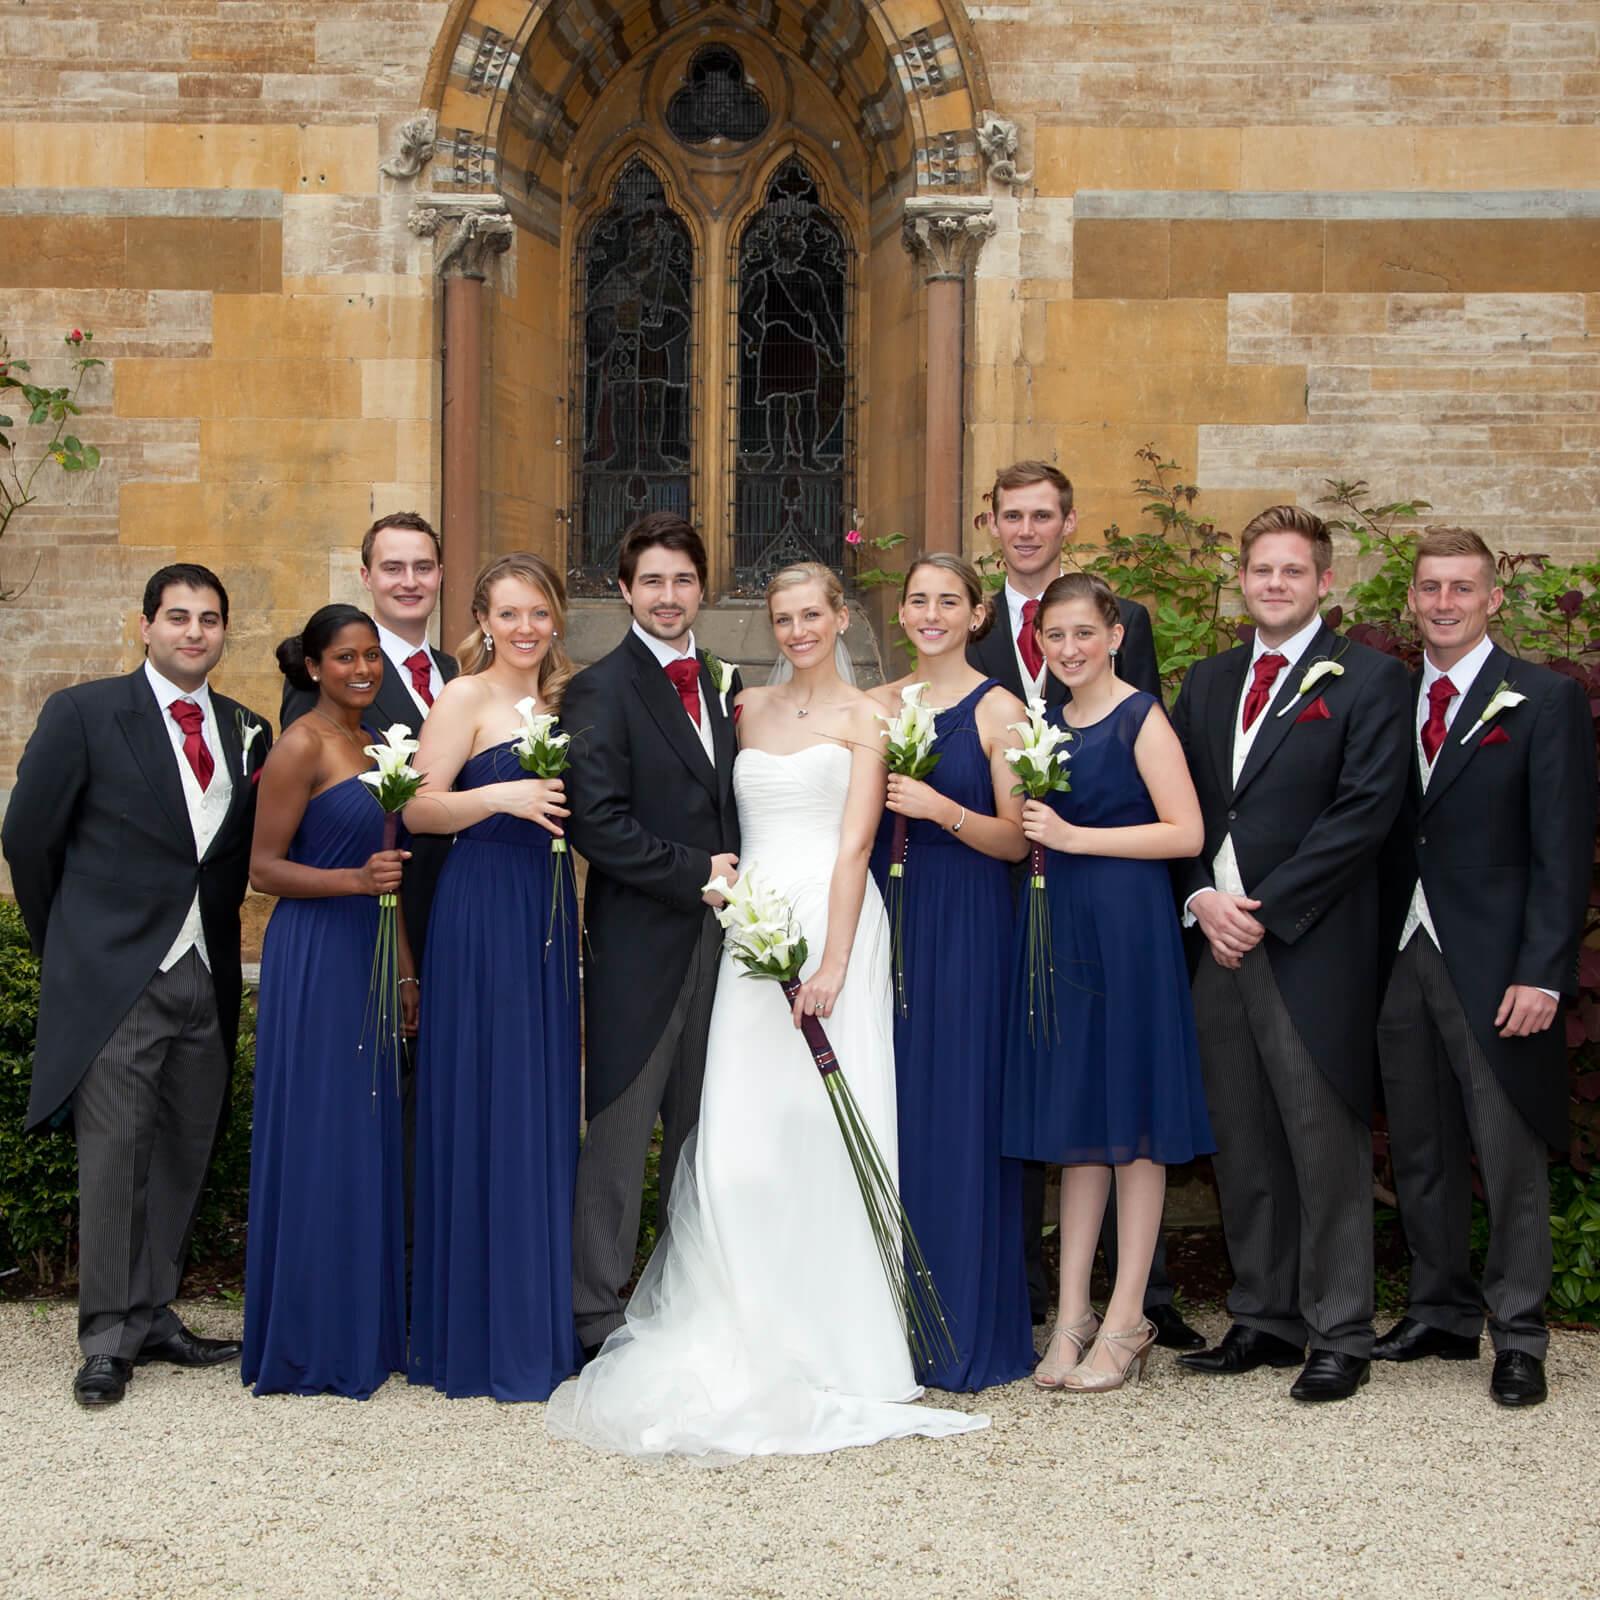 Warwickshire-wedding-photographer-Ettington-Park-Hotel-5